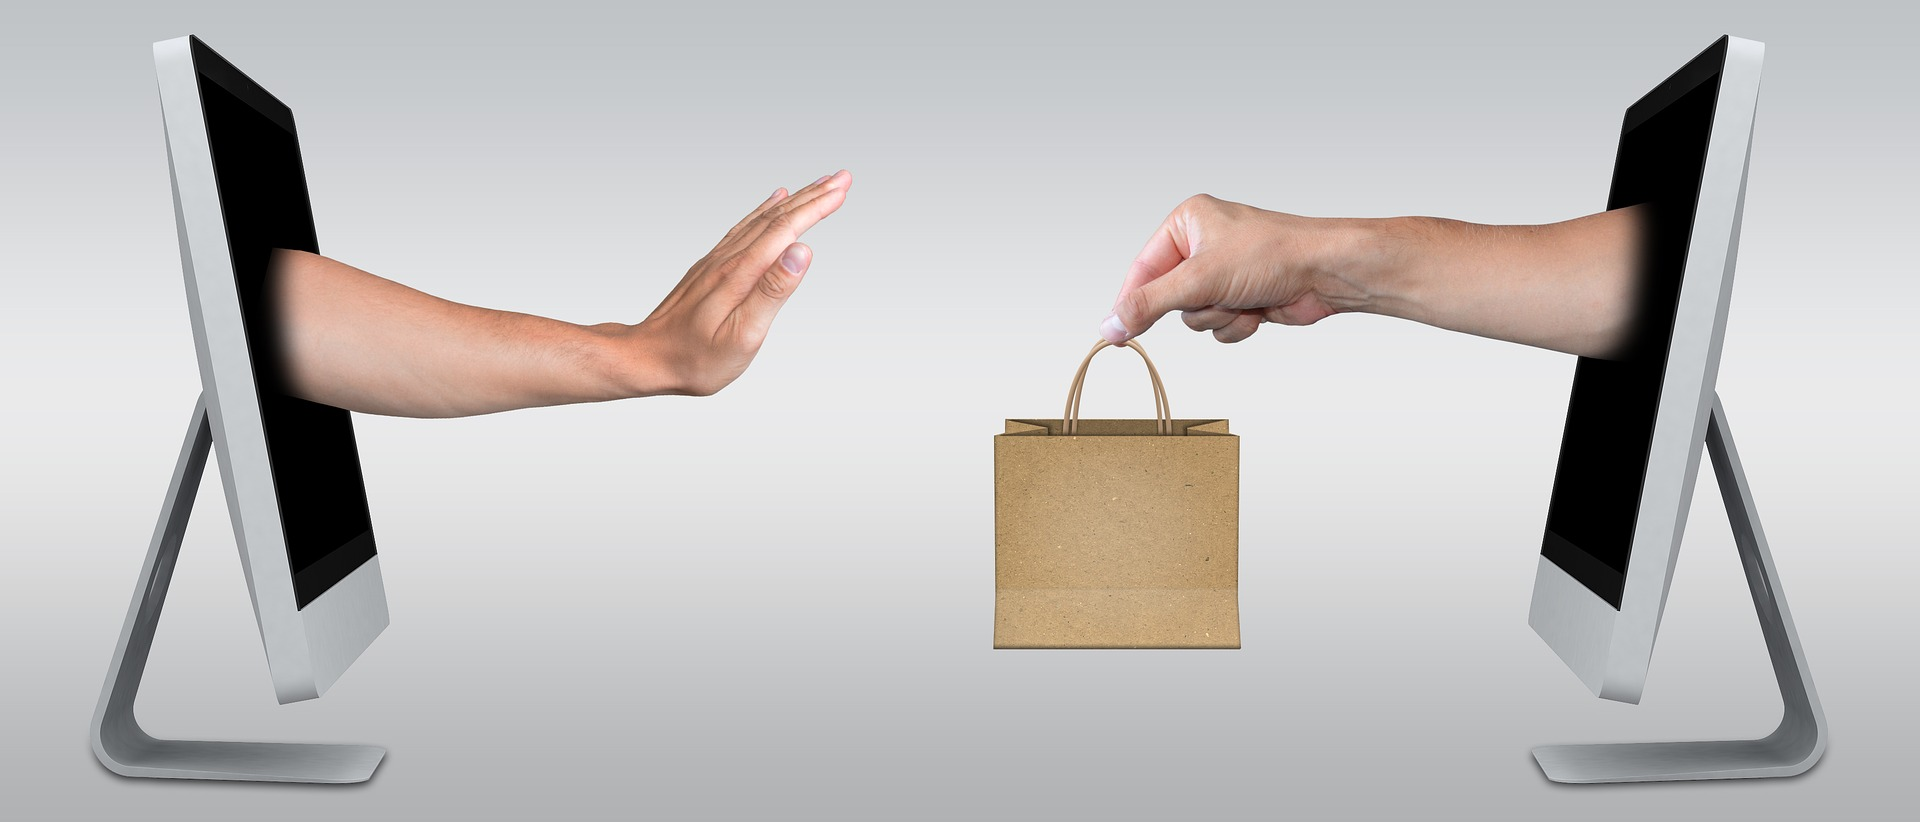 sales training technology